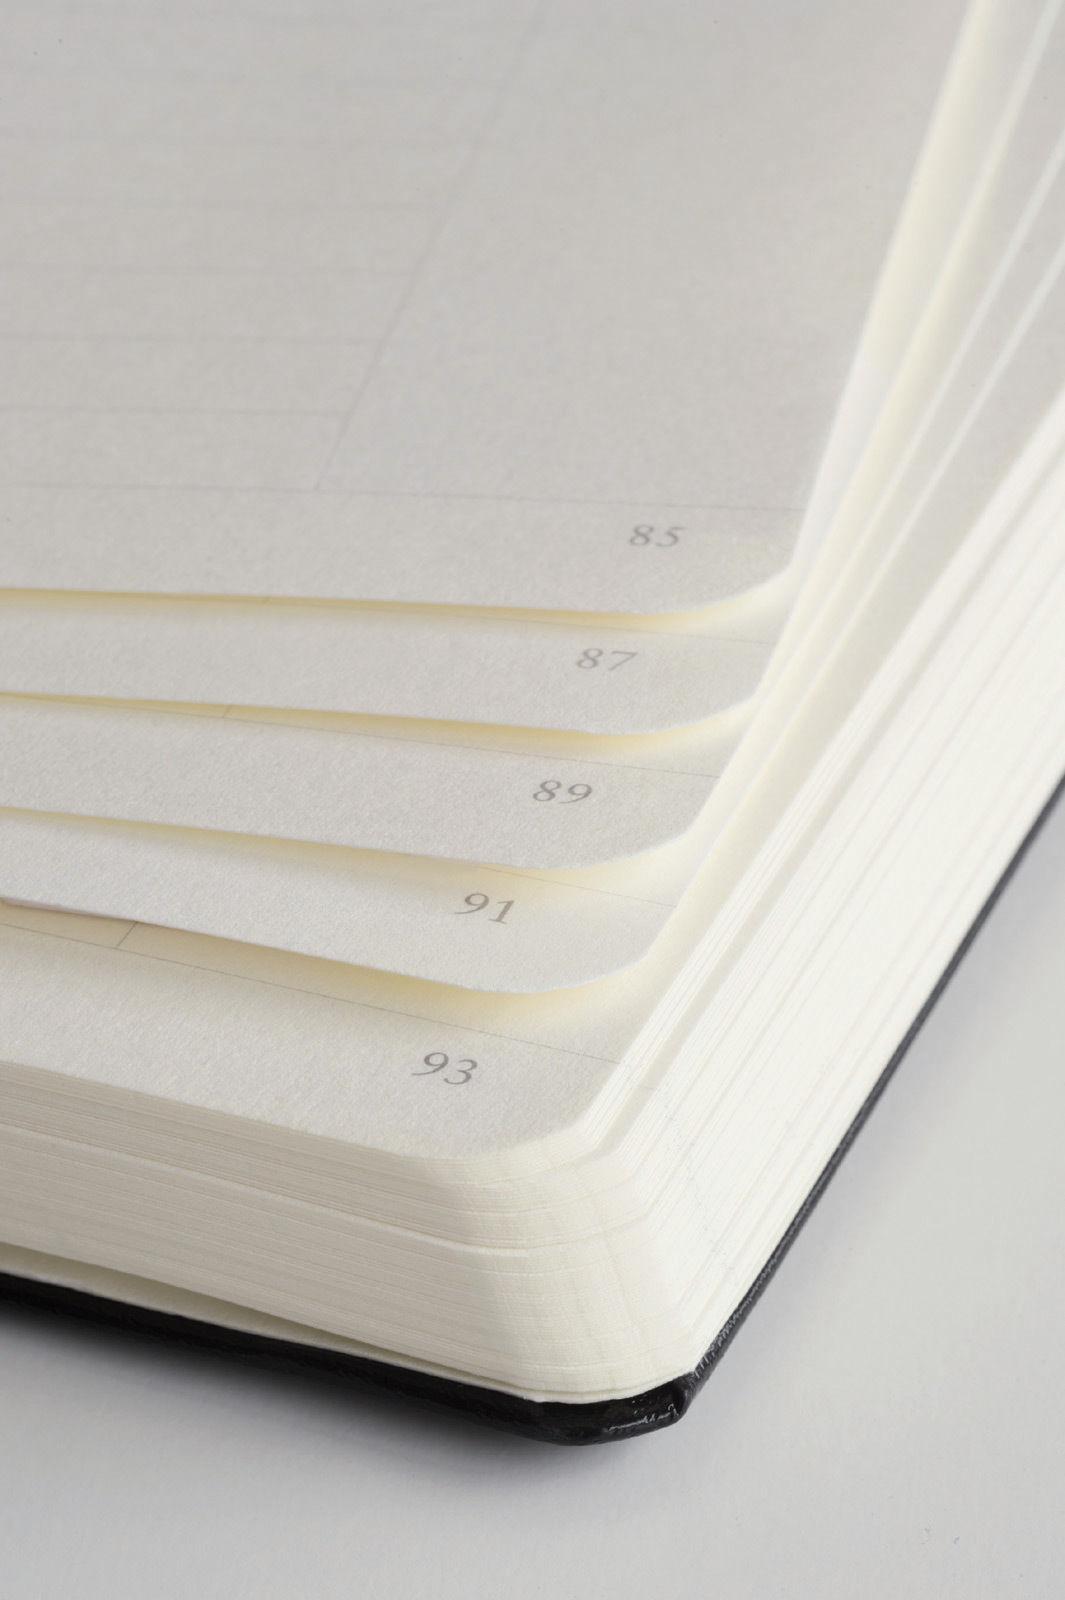 Leuchtturm1917-100Years-Metallic-Edition-A6-Hardback-Notebook-Gold-Silver-Copper-152488682213-8